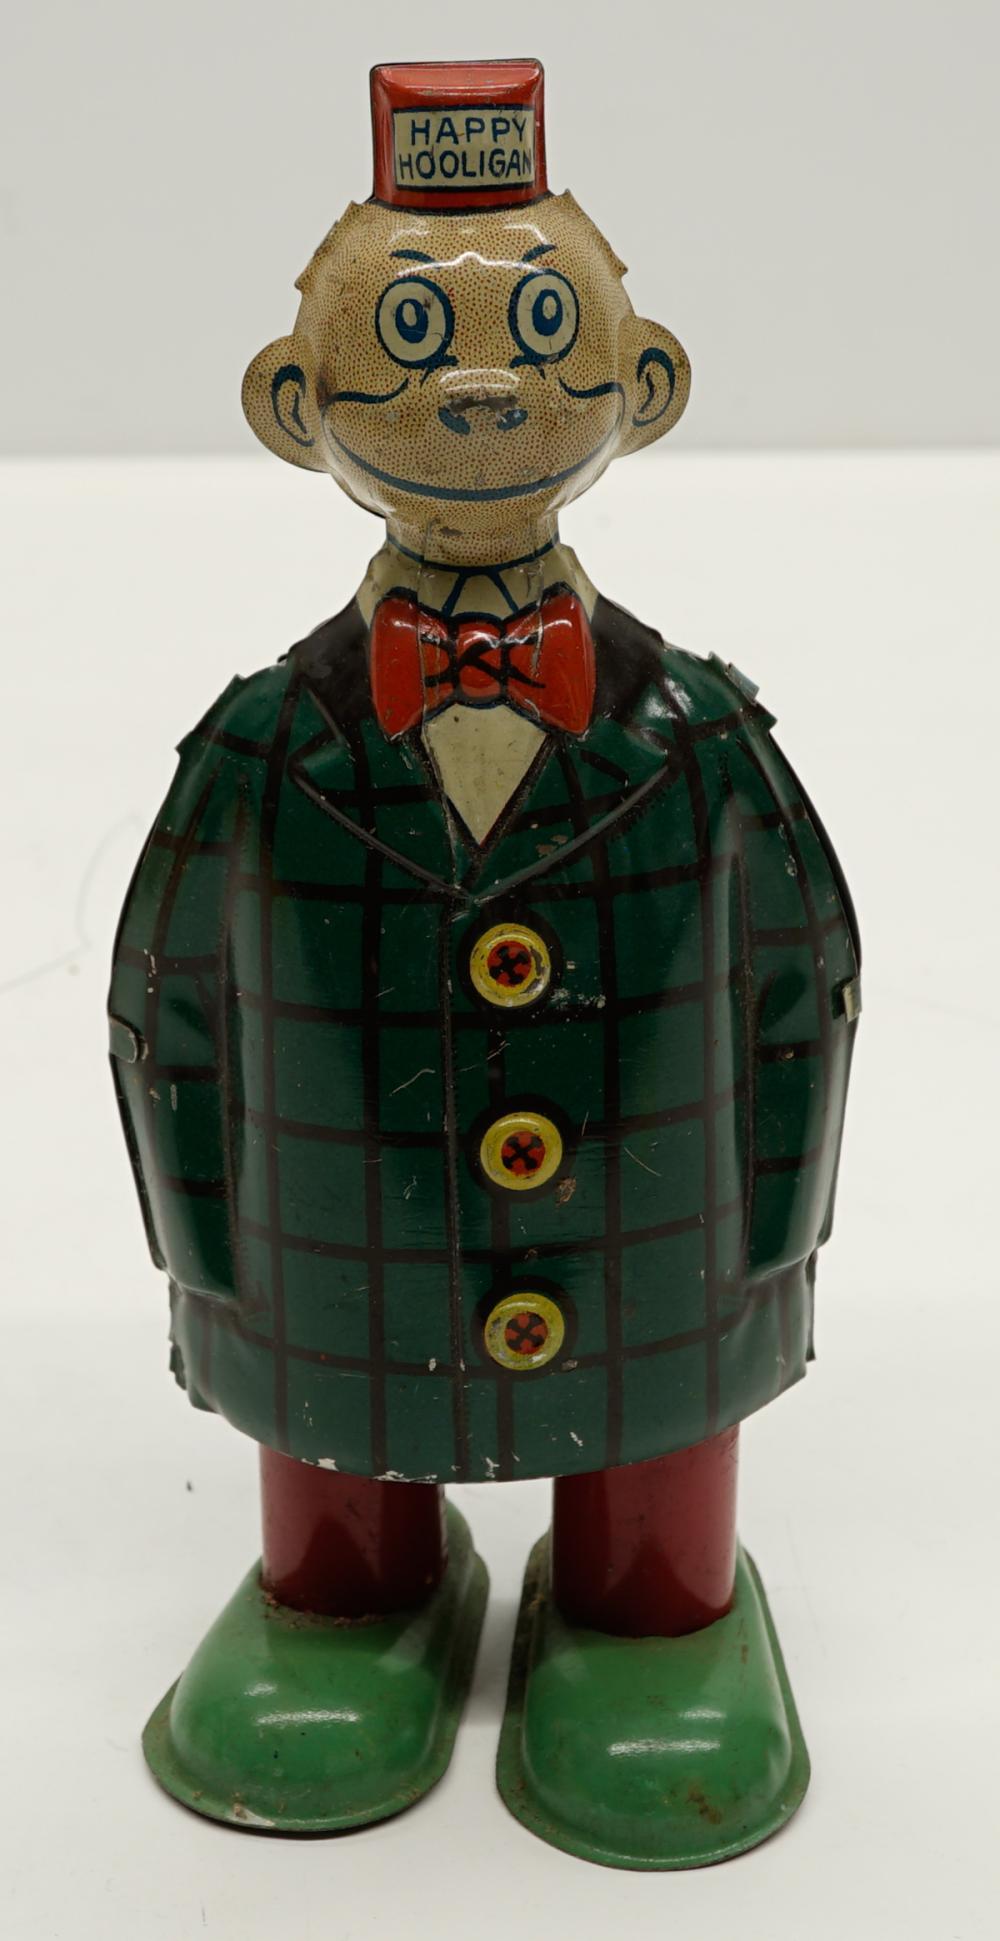 Chein Happy Hooligan Tin Wind-Up Toy